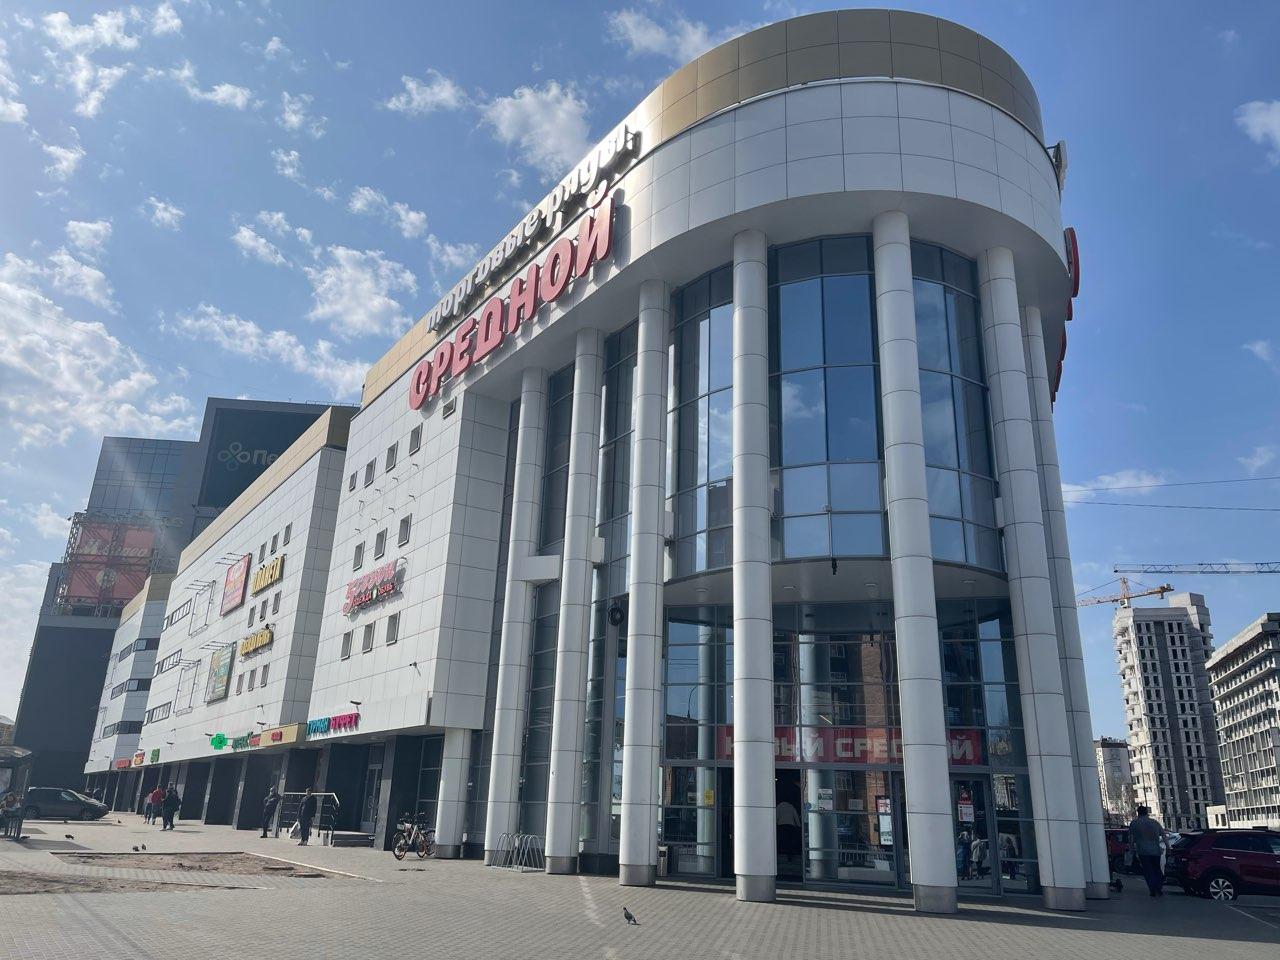 ЖК для сторонников ЗОЖ построят в центре Нижнего Новгорода - фото 2